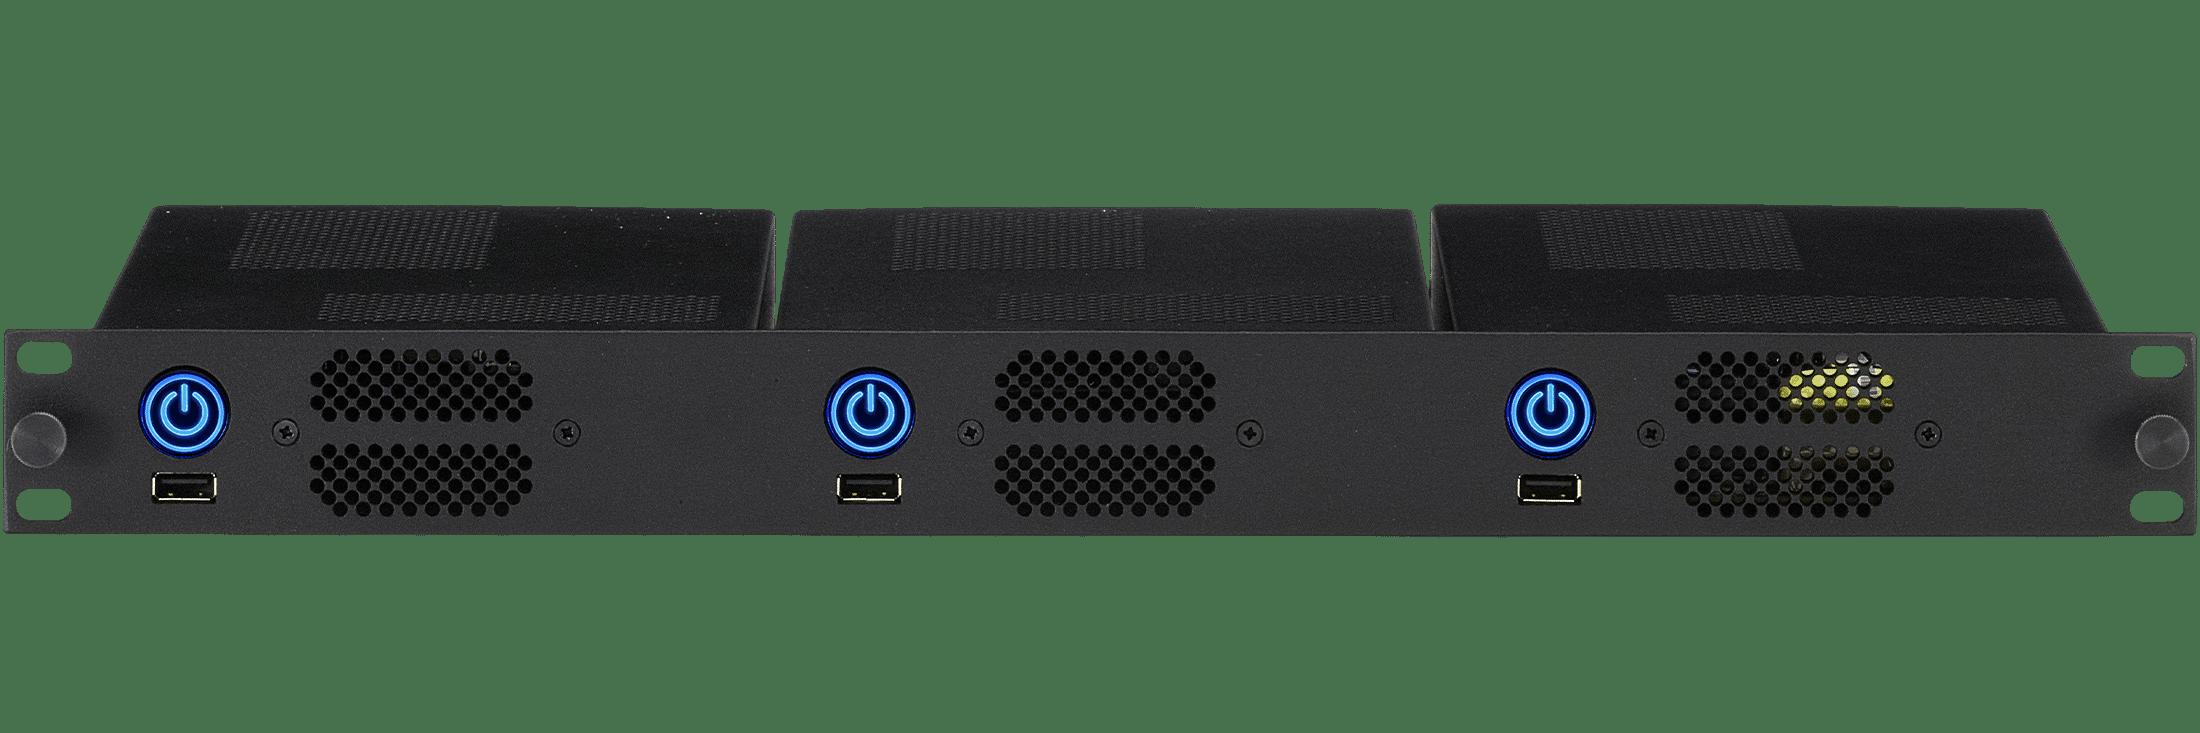 3 Intel NUCs in 1U Rack Mount